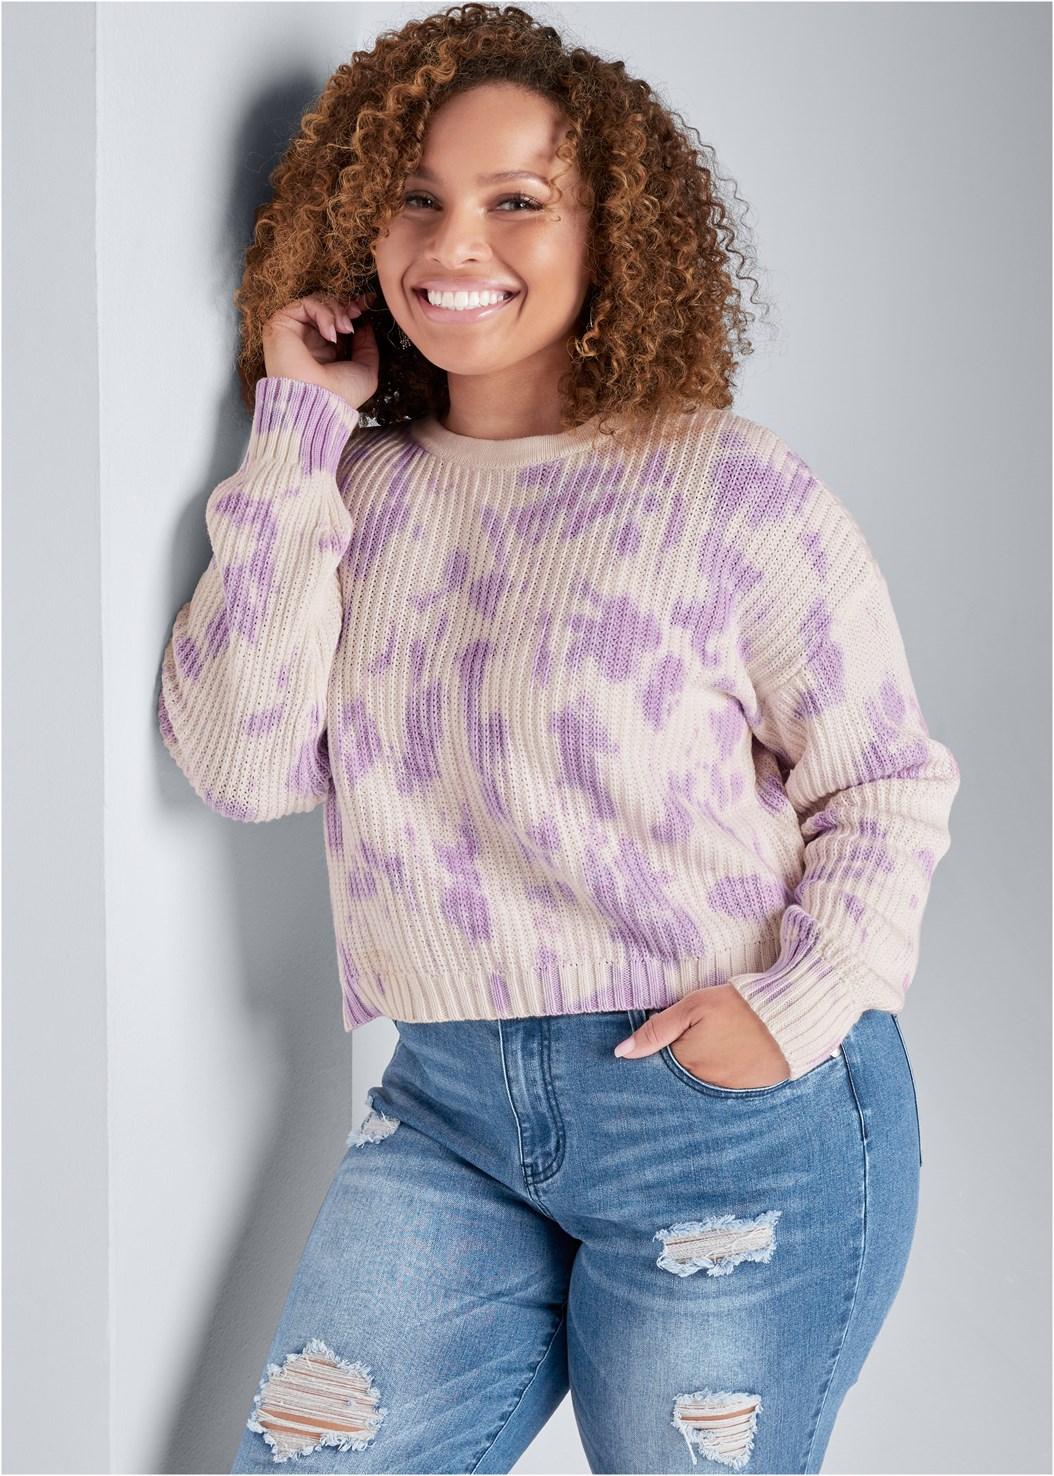 Oversized Tie Dye Sweater,Basic Cami Two Pack,Triangle Hem Jeans,Ripped Capri Jeans,Rhinestone Flats,Essential Espadrille Wedges,Beaded Hoop Earrings